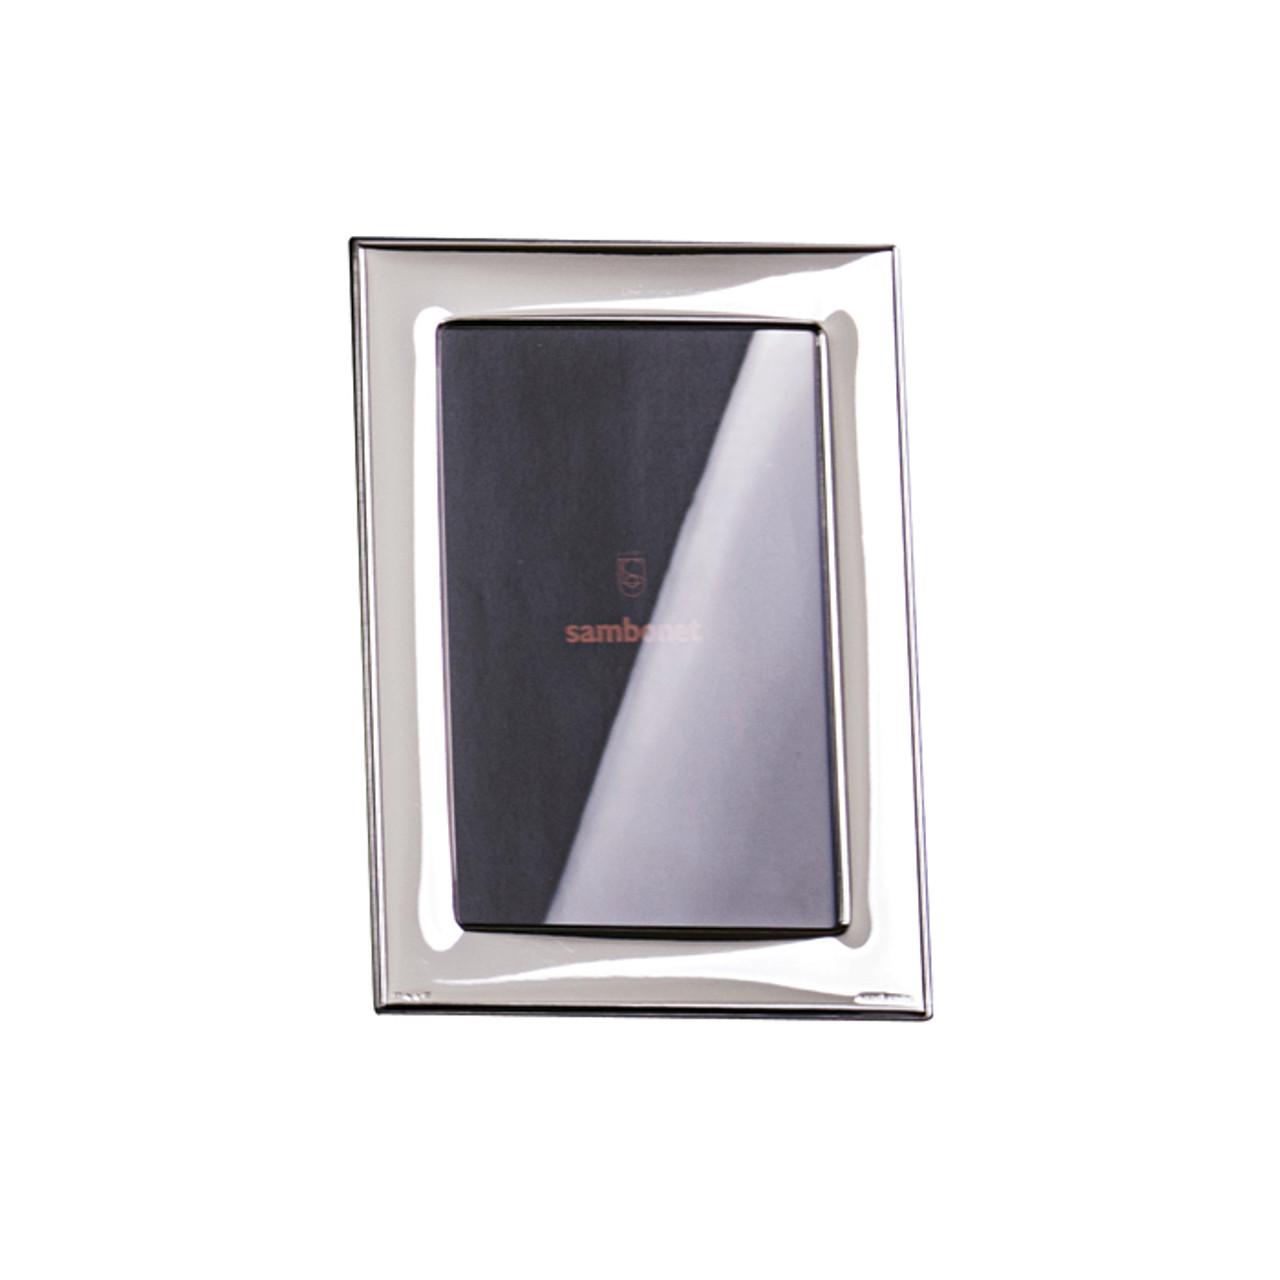 Frames Flat Frame 3 12 X 5 Inch Sambonet Online Store